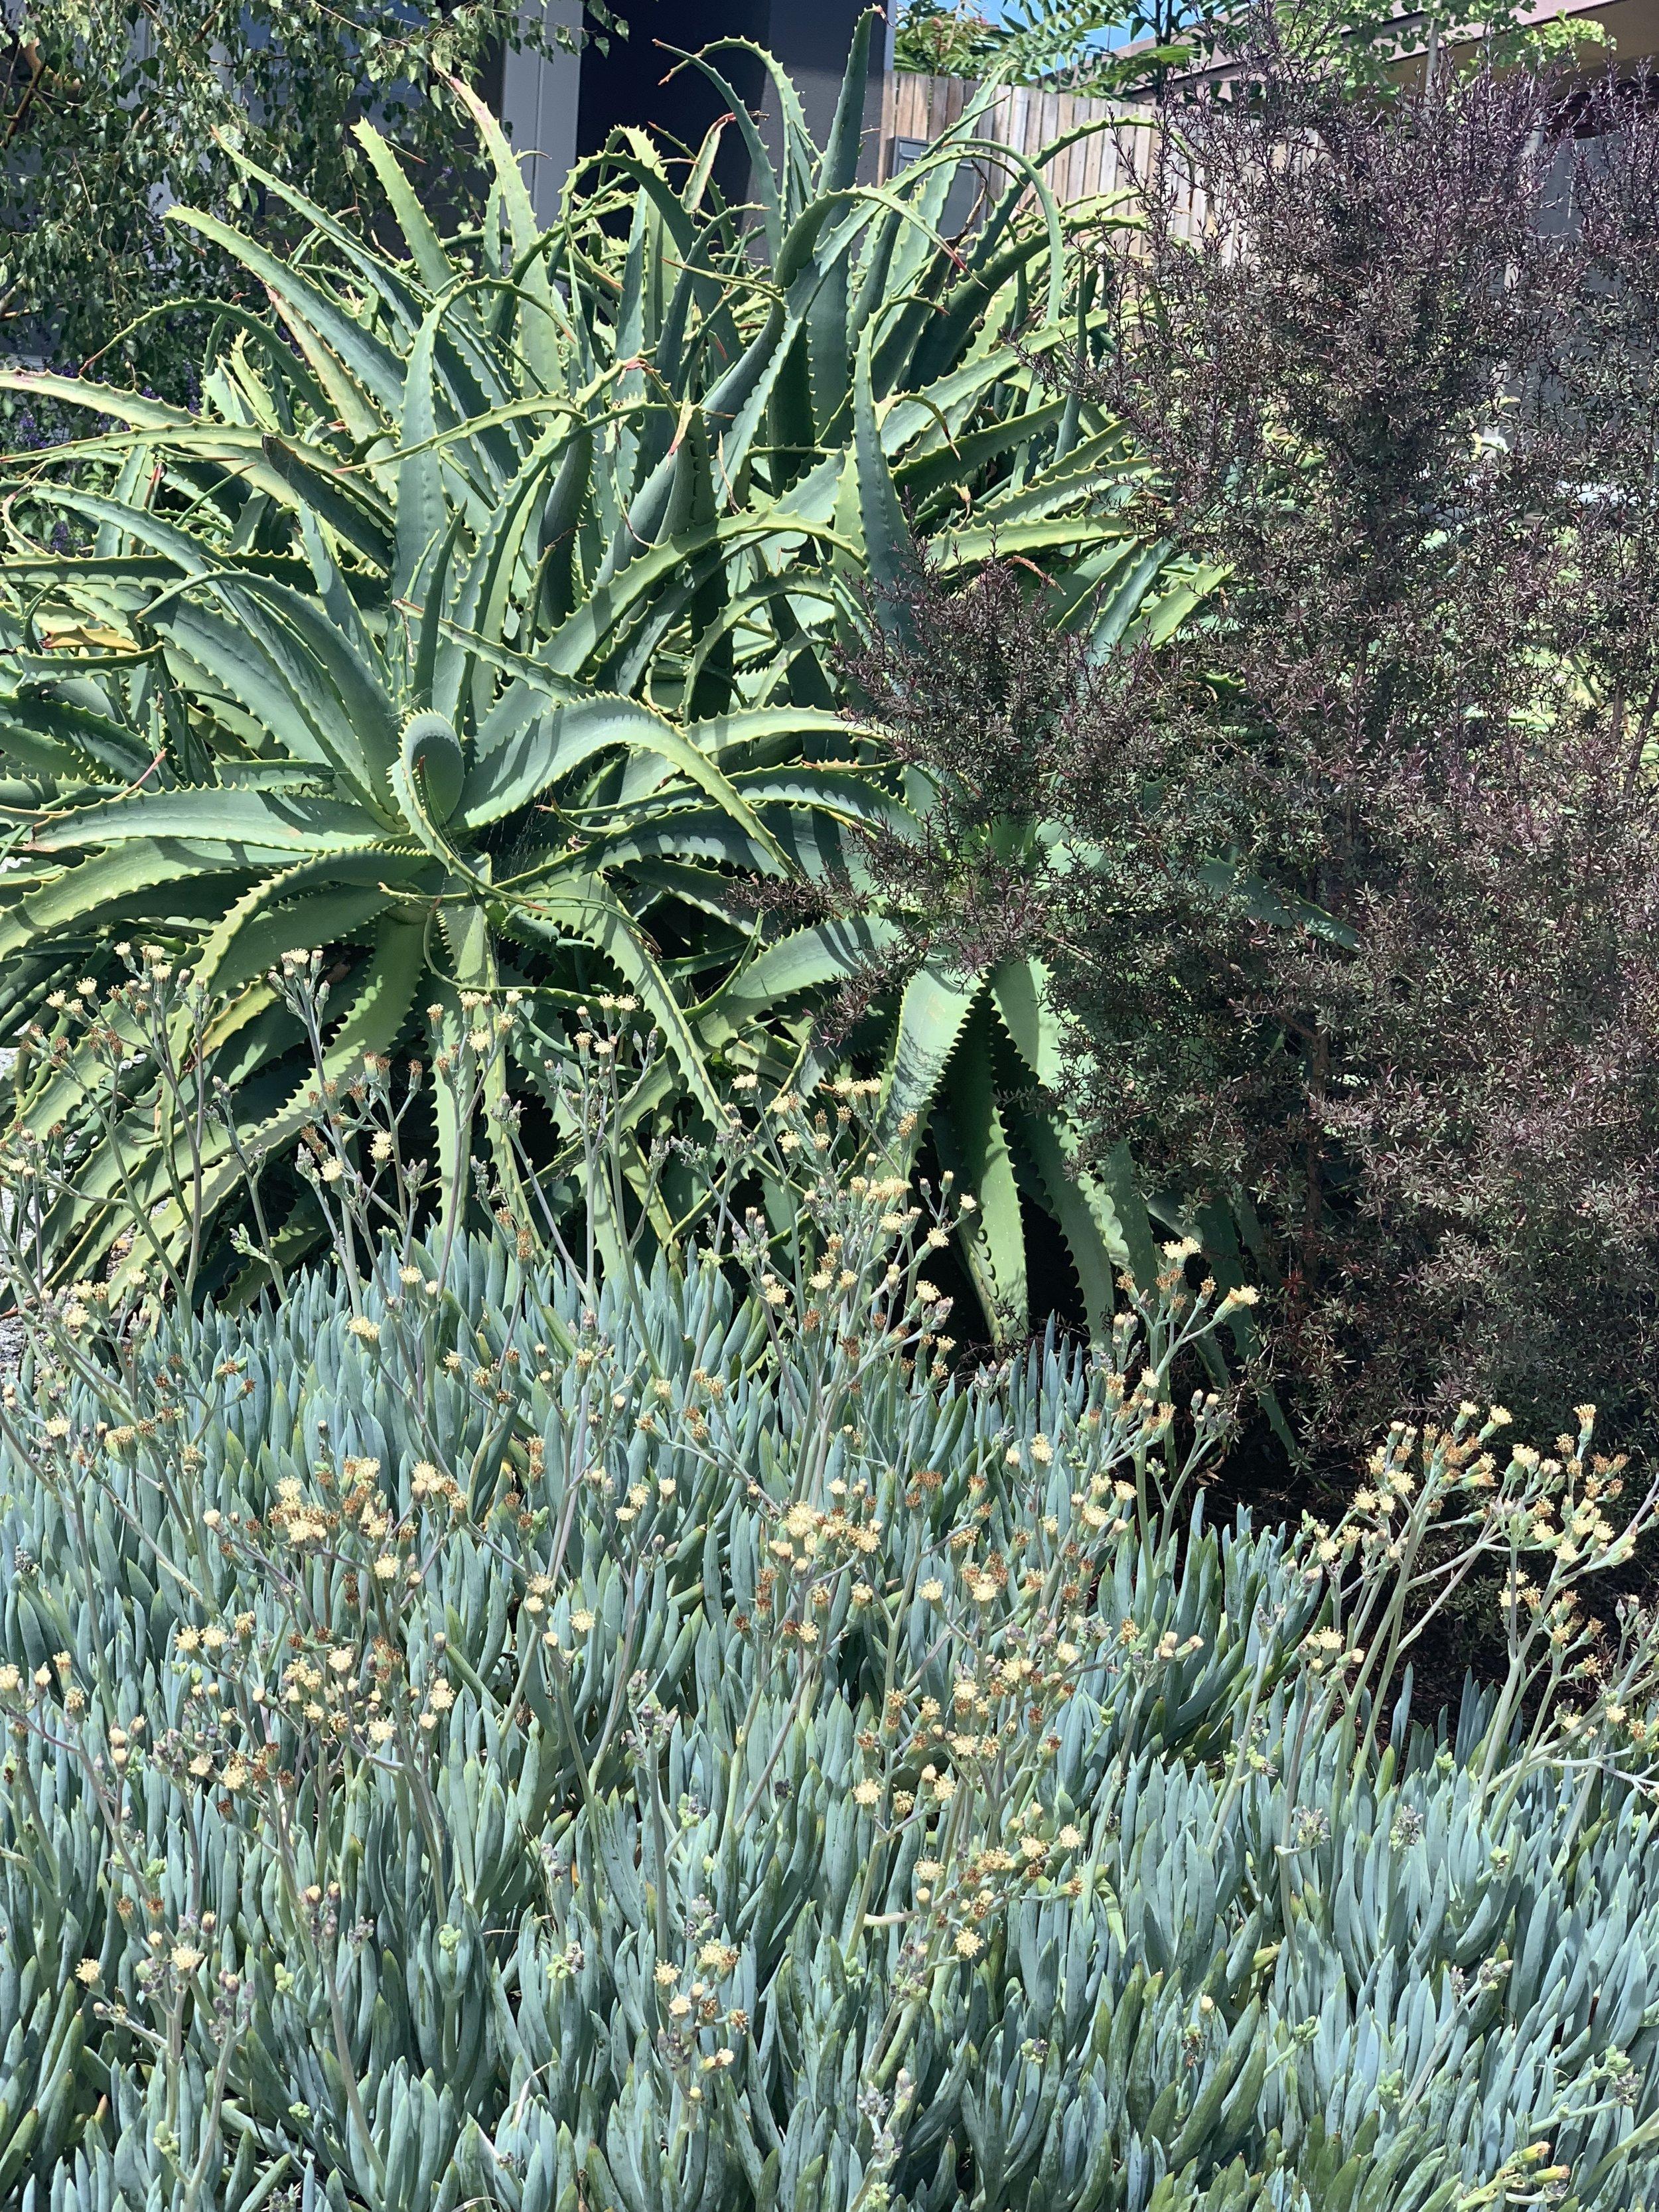 Skindepth's Native Medicinal Garden